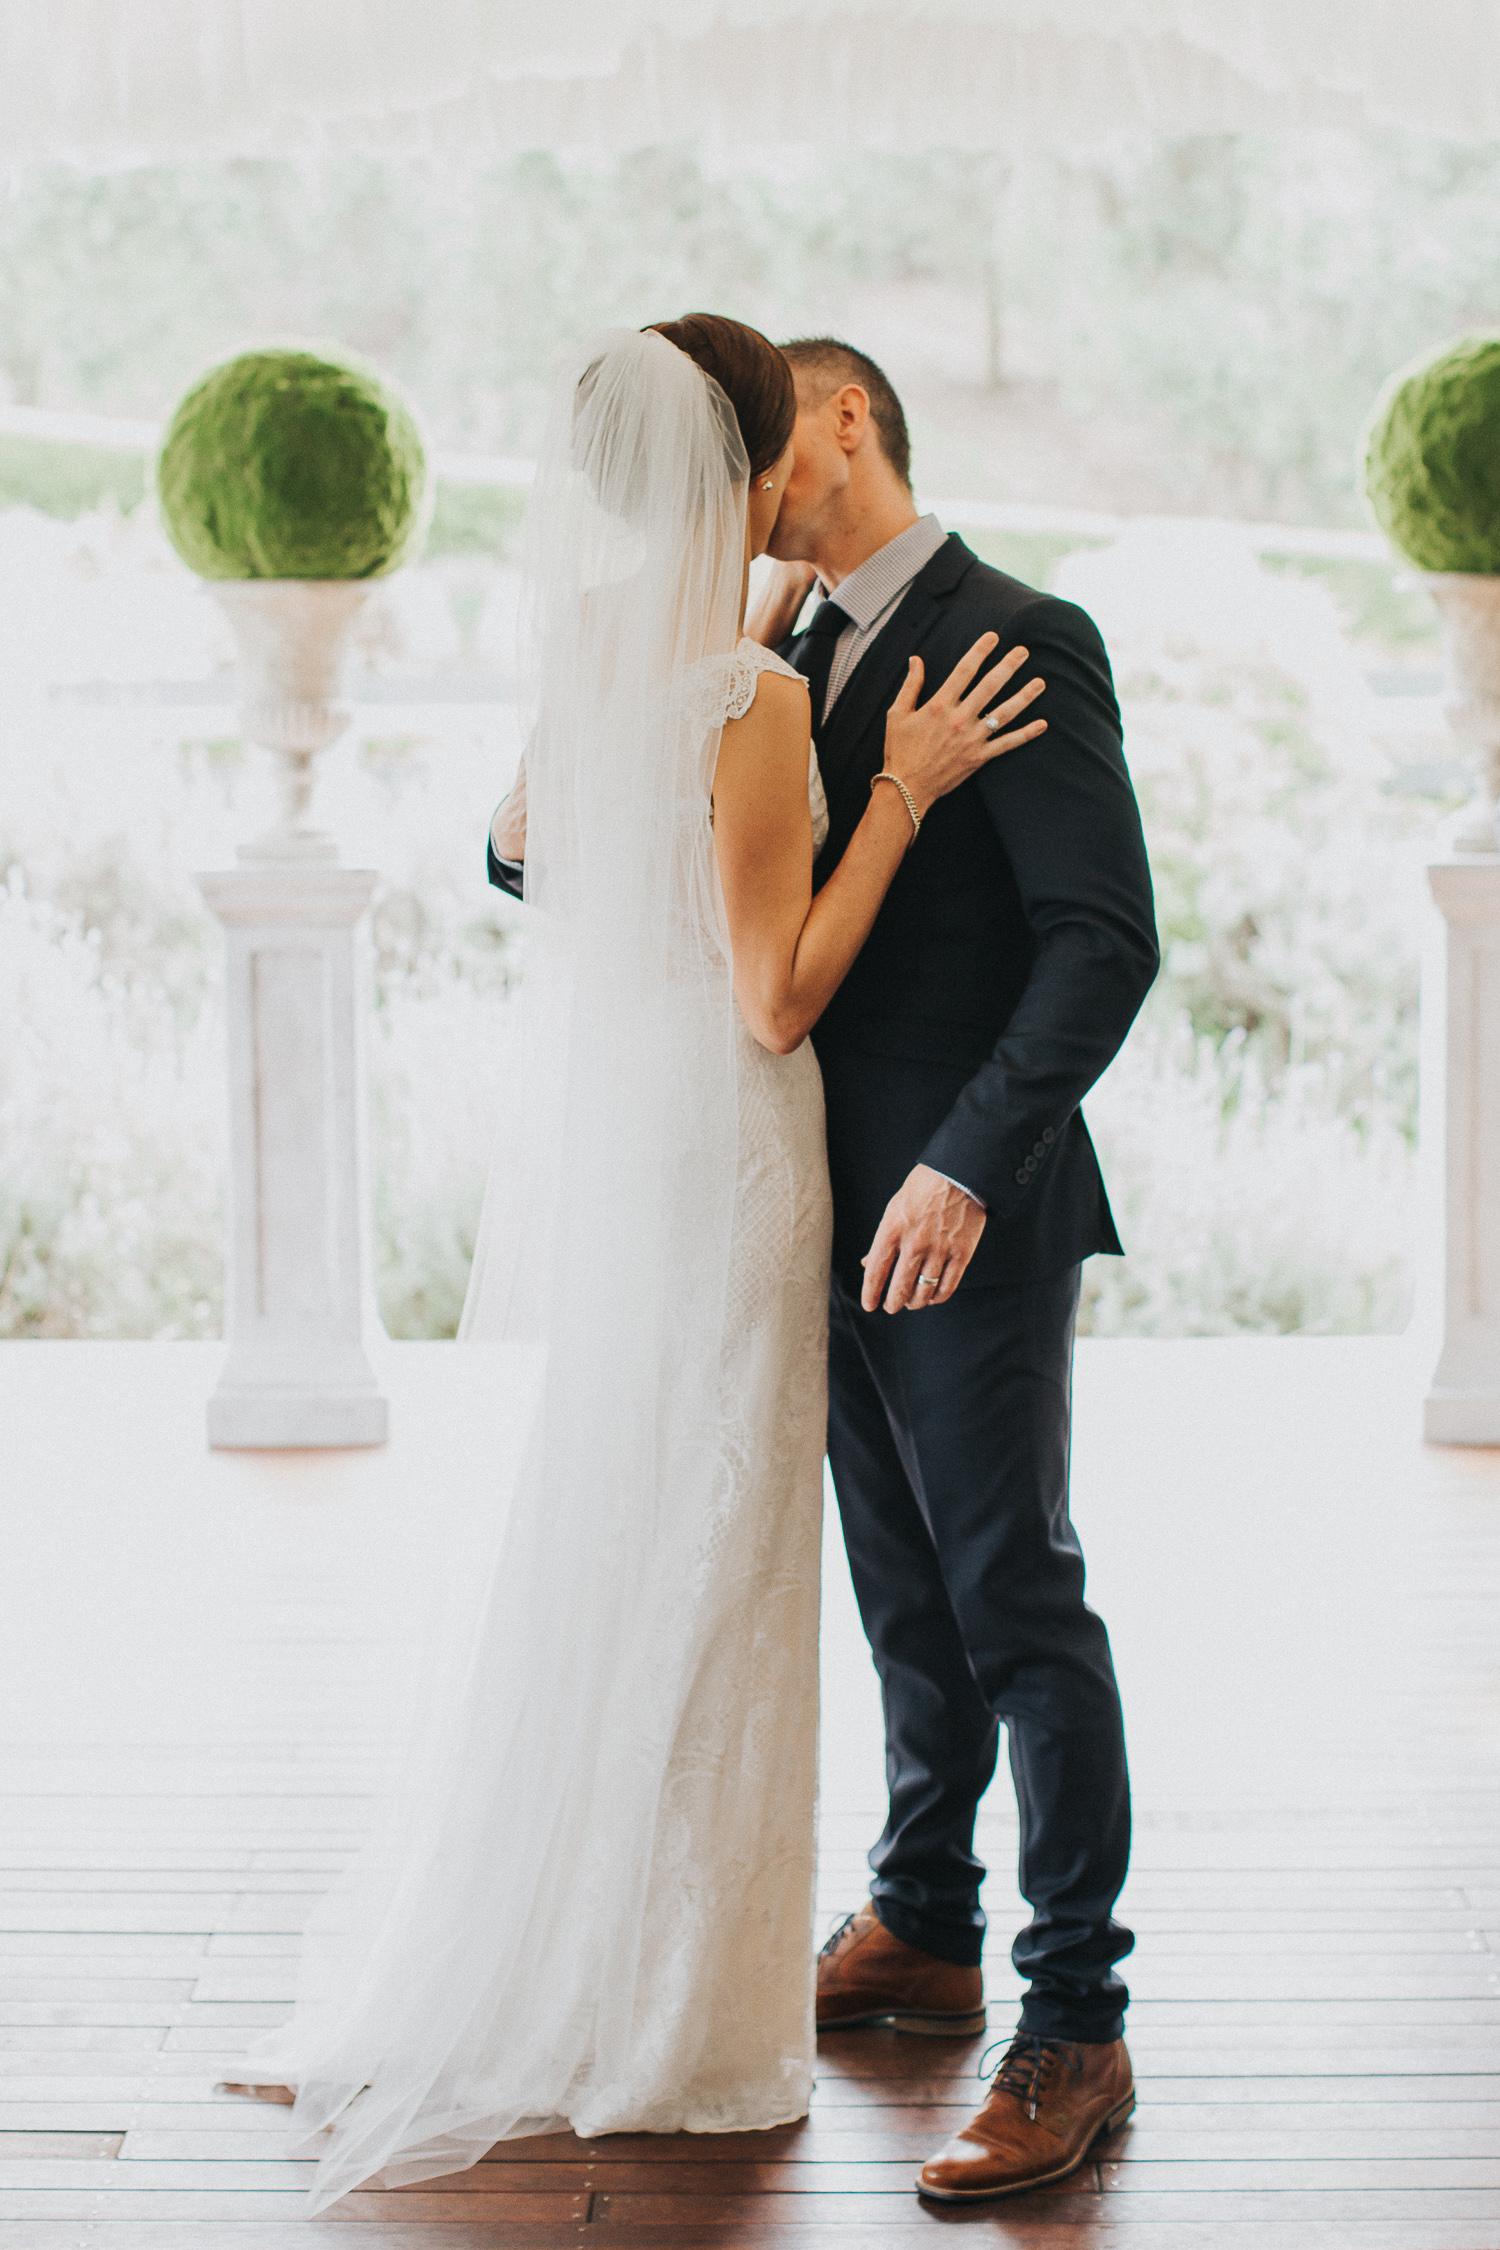 LIZ ANDREW BRACU WEDDING069.JPG